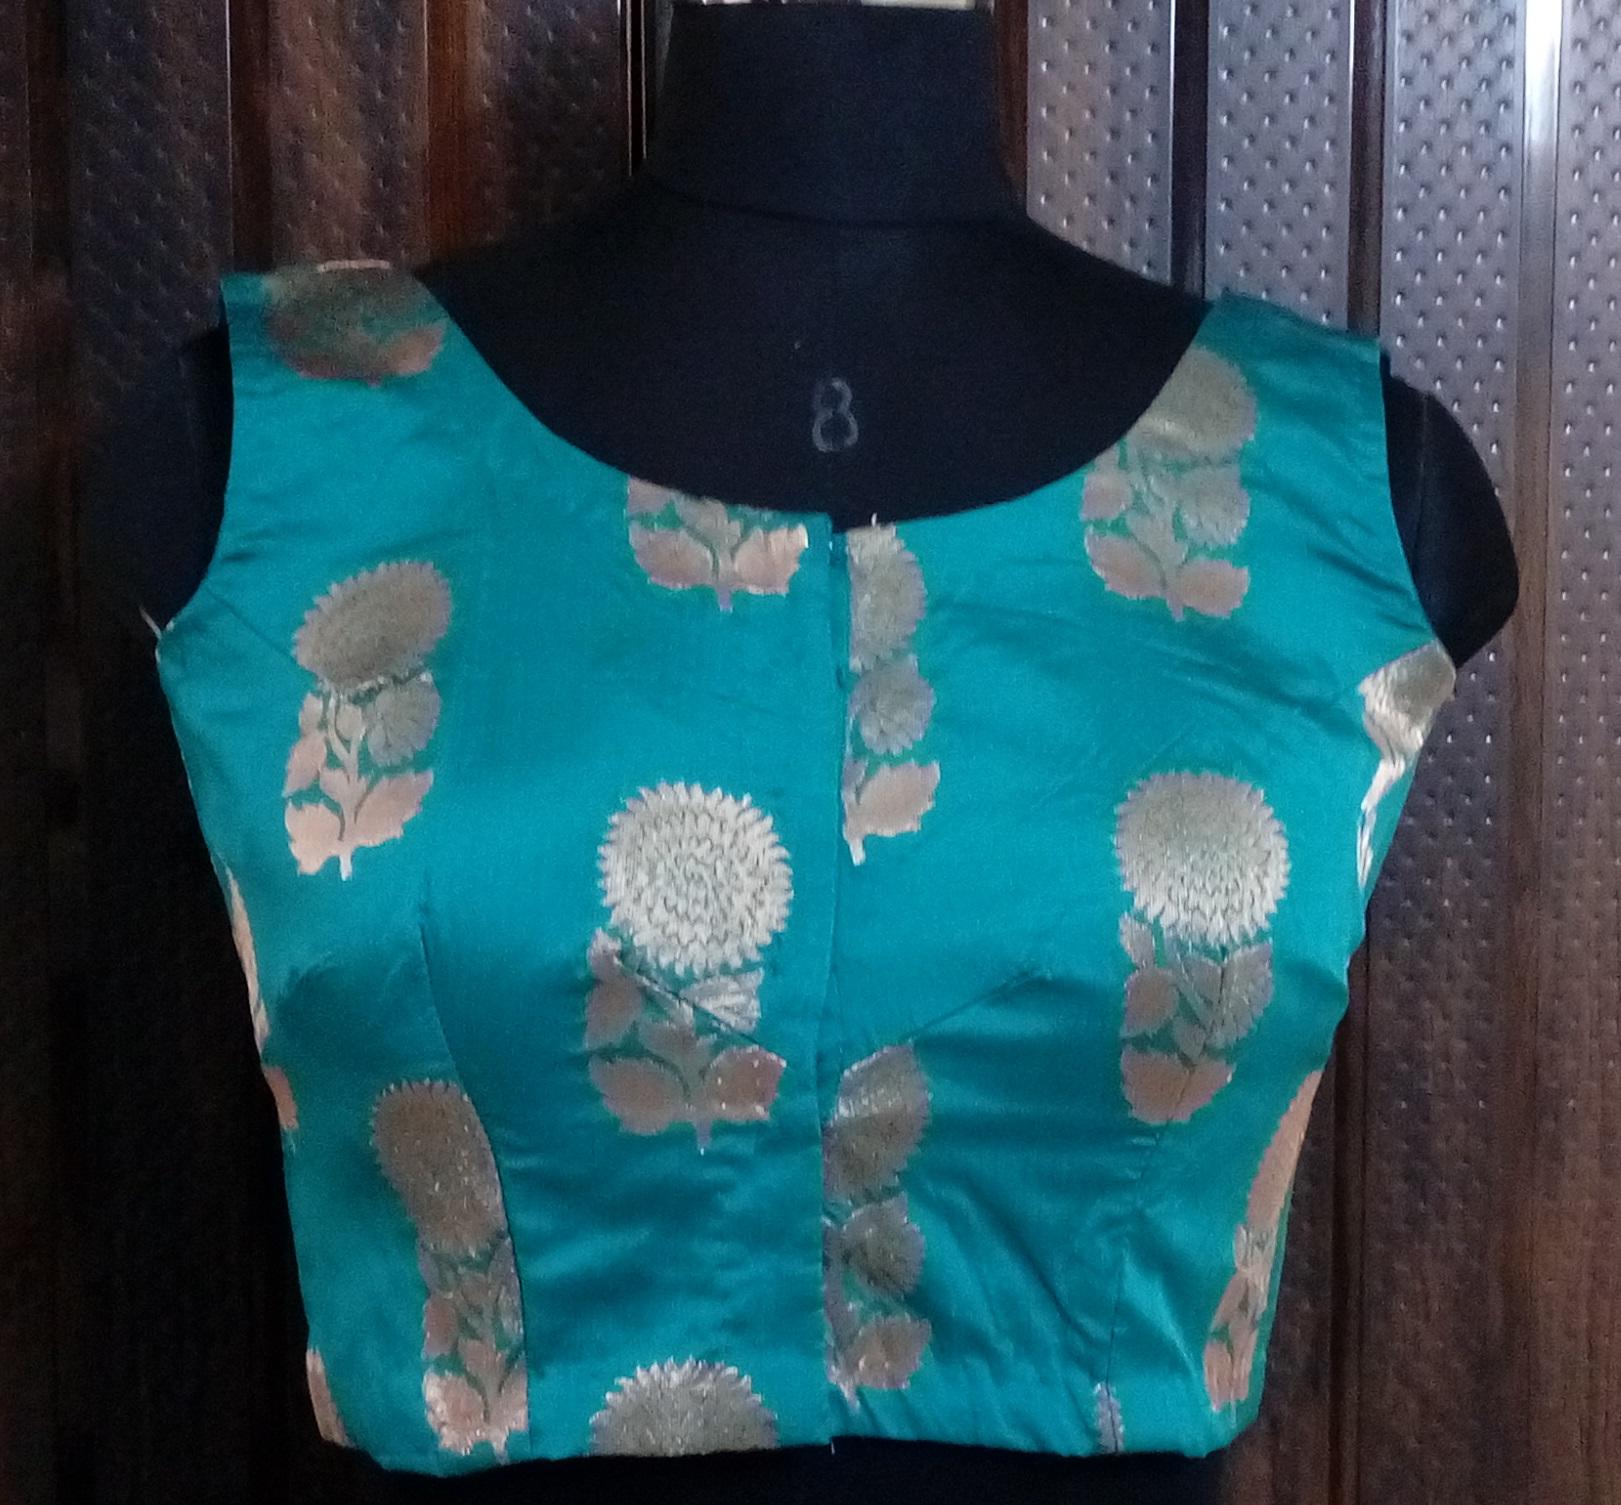 Blue brocade dupion blouse